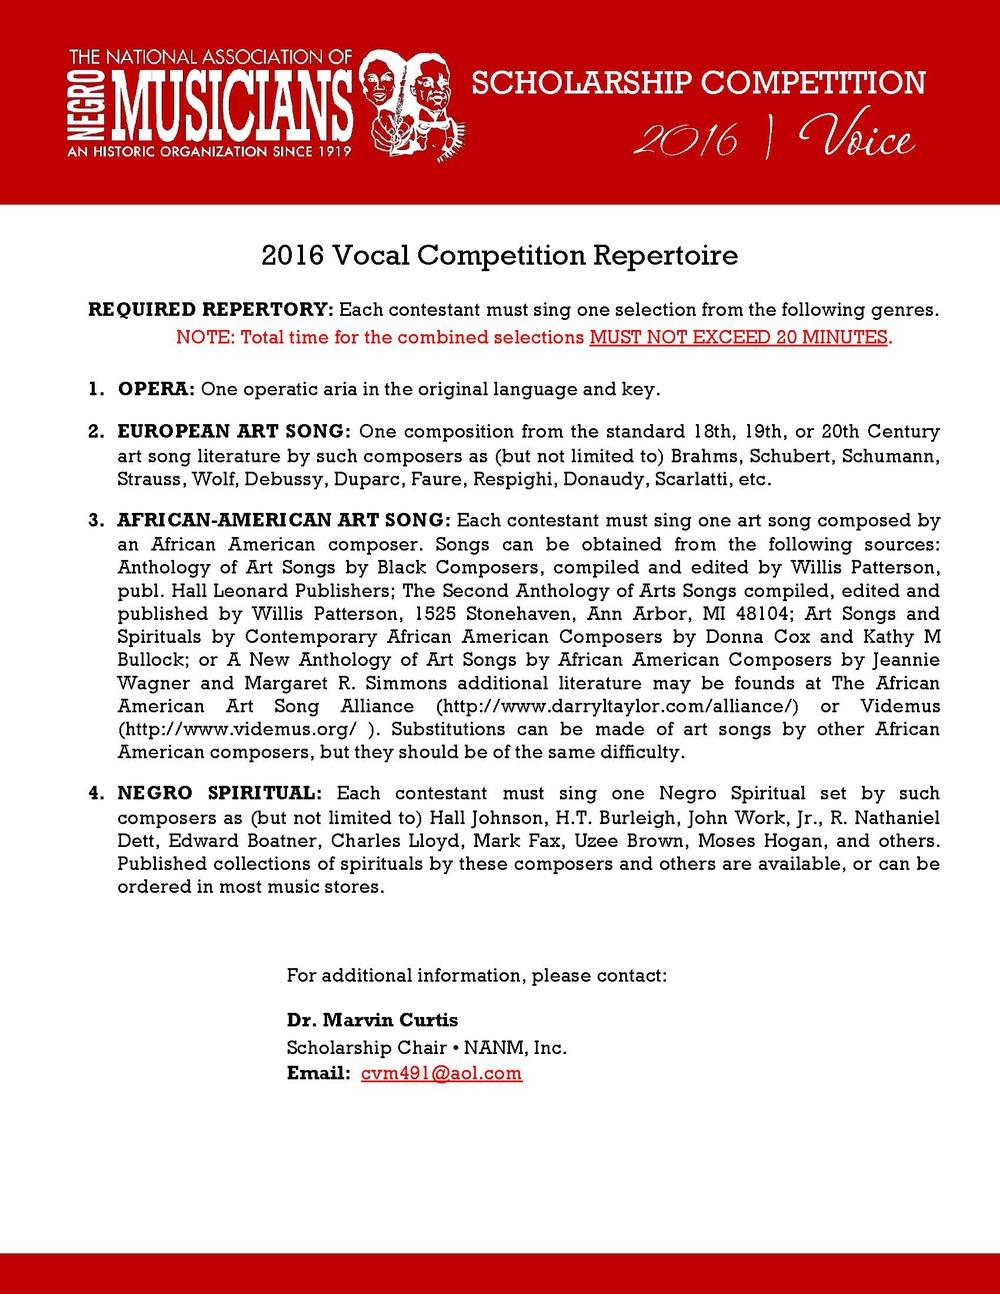 2016-nanm-scholarship-repertoire.jpg